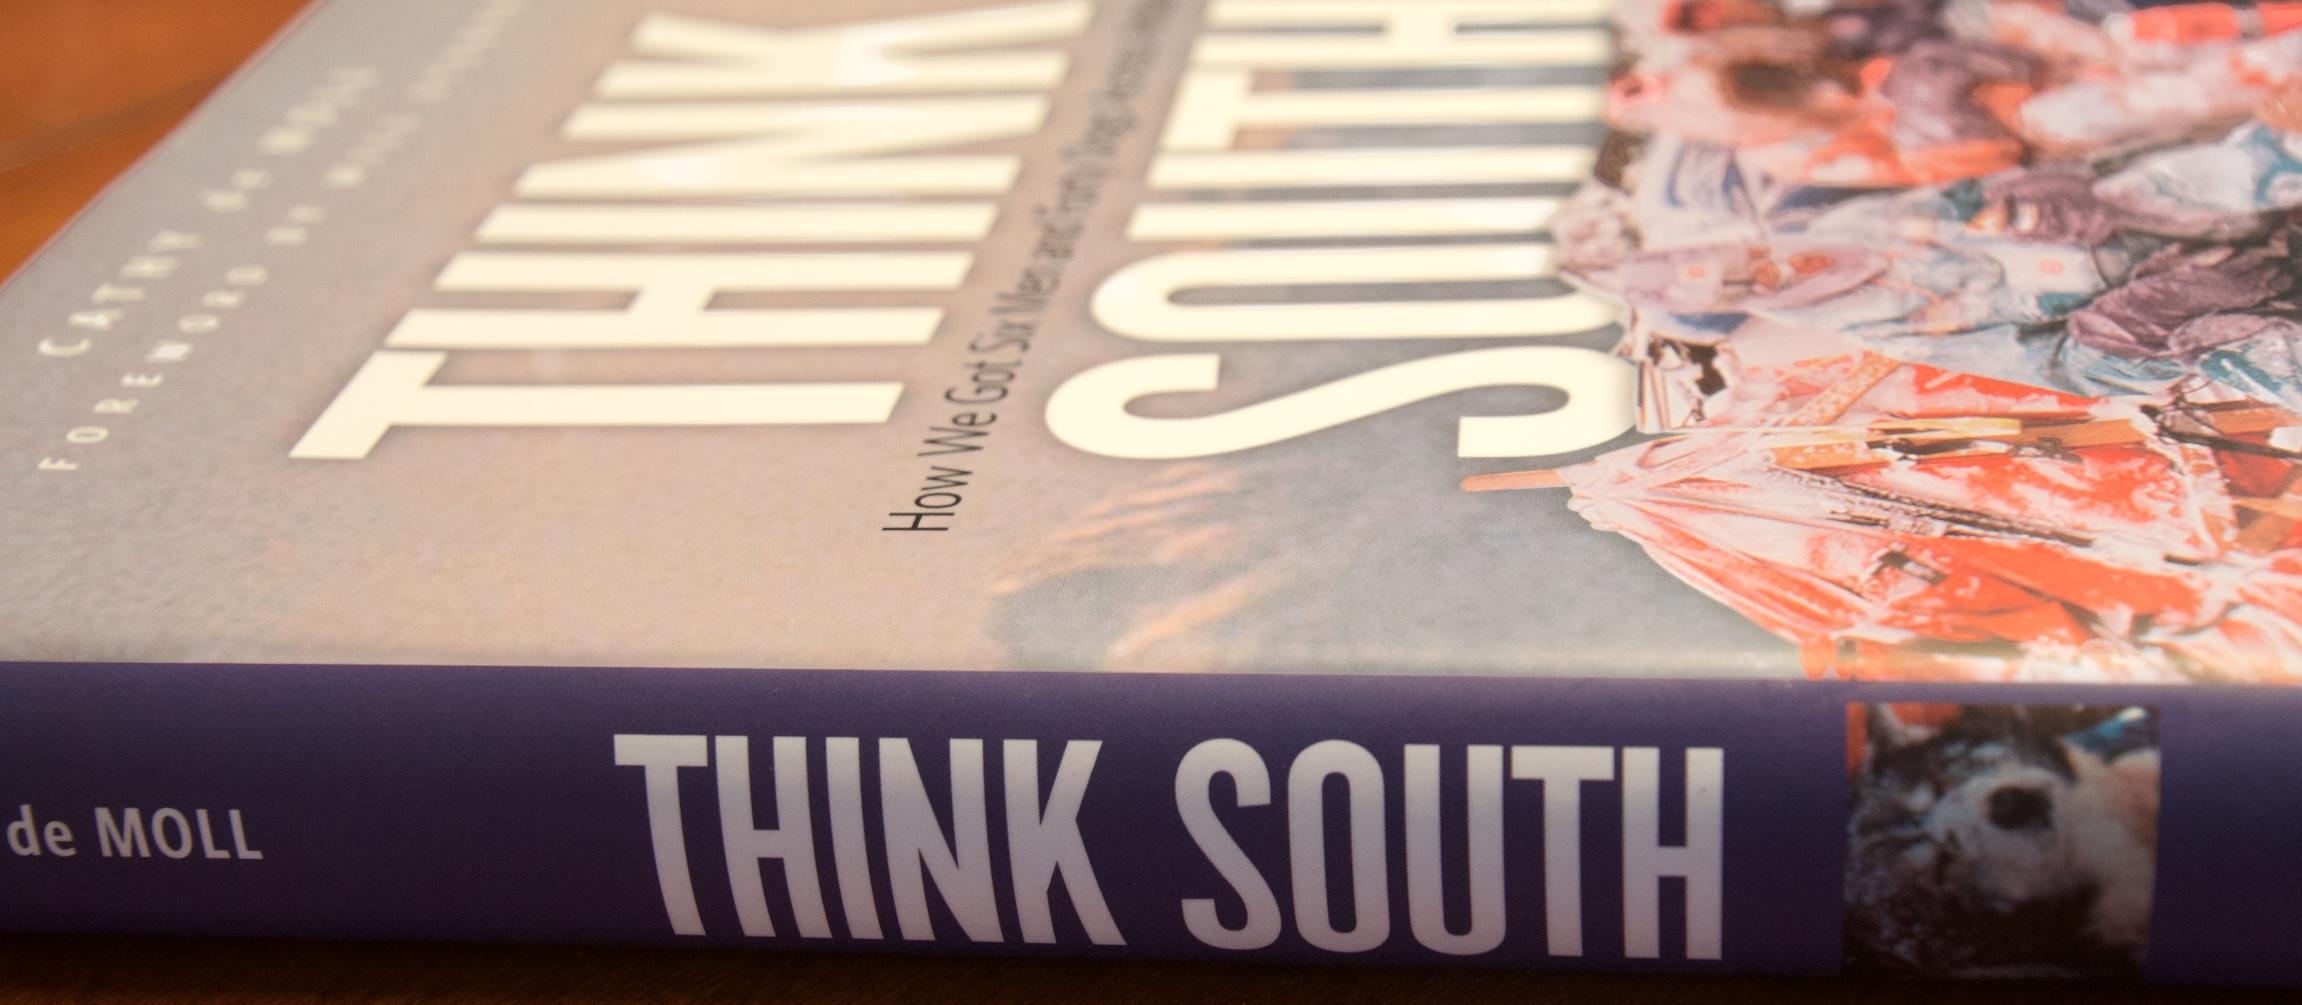 ThinkSouth.jpg